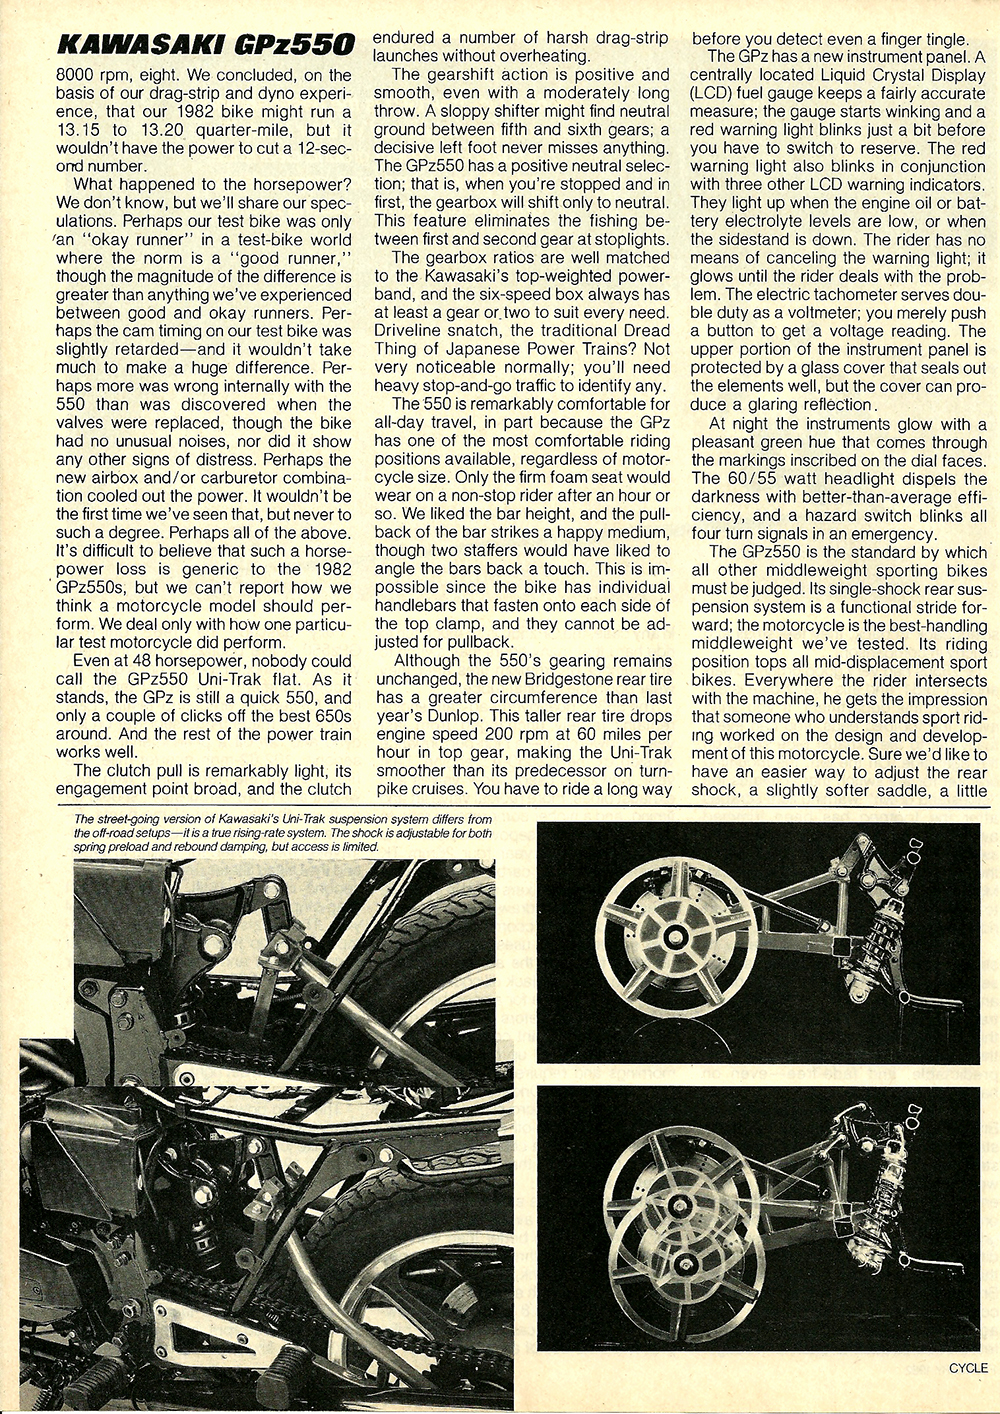 1982 Kawasaki GPz550 road test 07.jpg